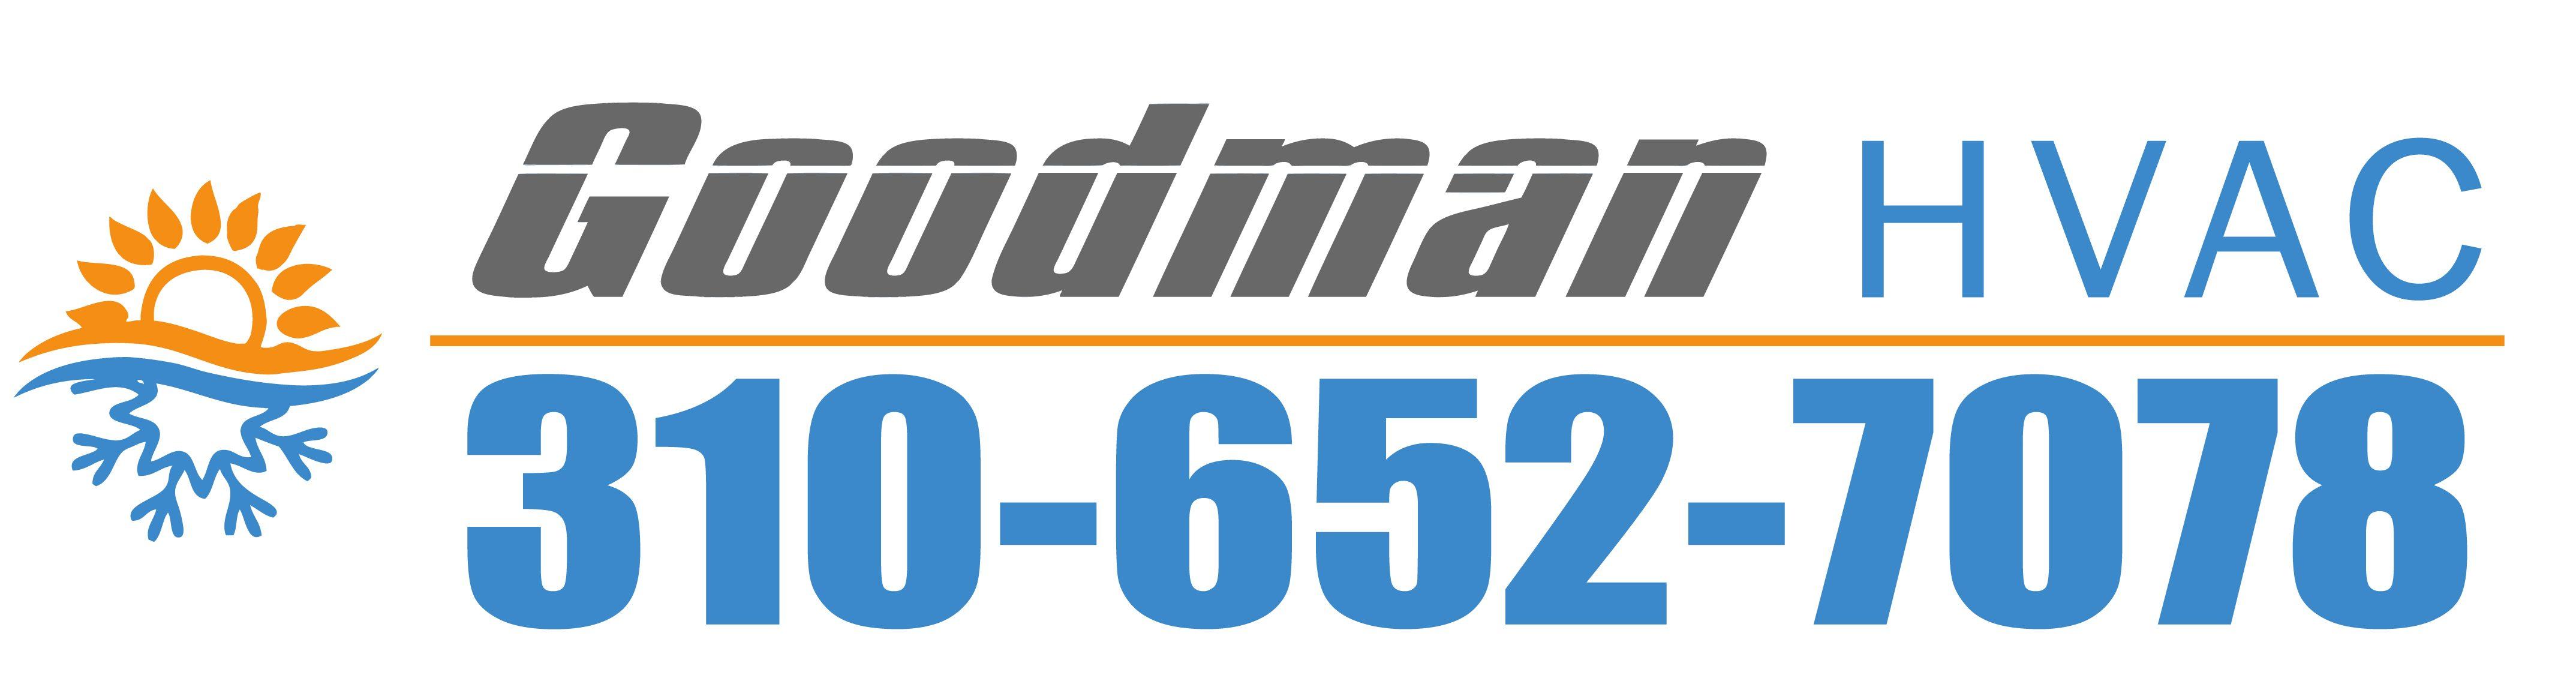 Goodman HVAC